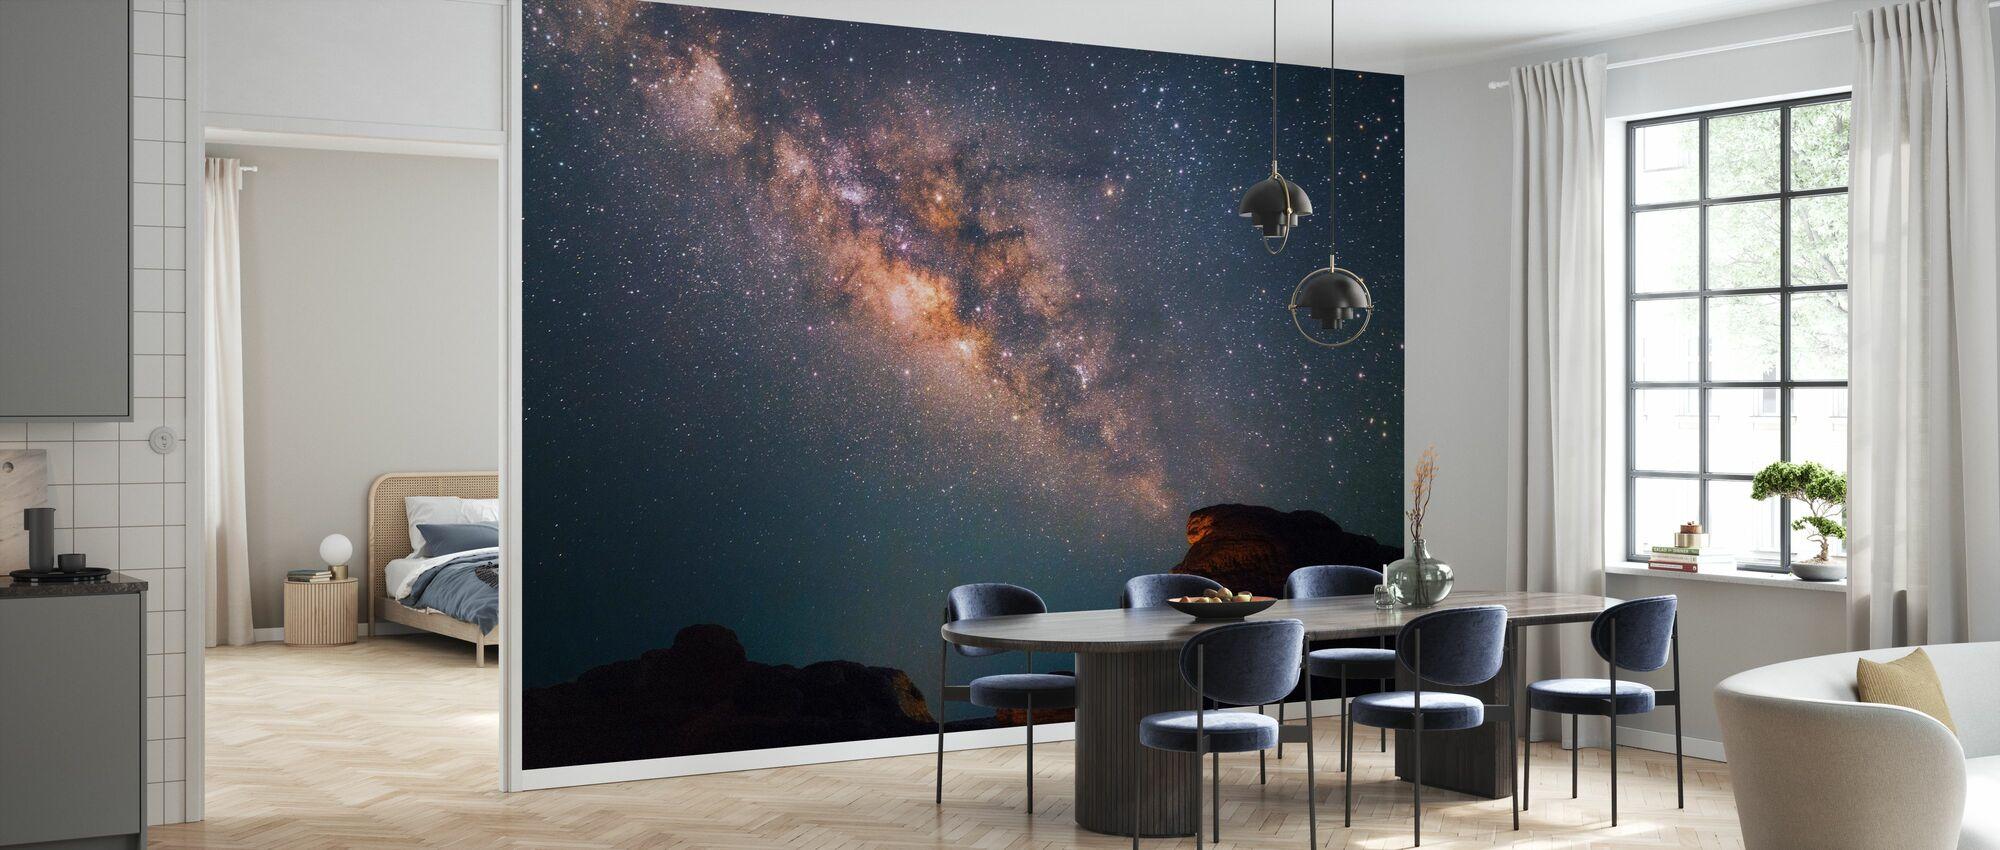 Stars Above Grand Canyon - Wallpaper - Kitchen